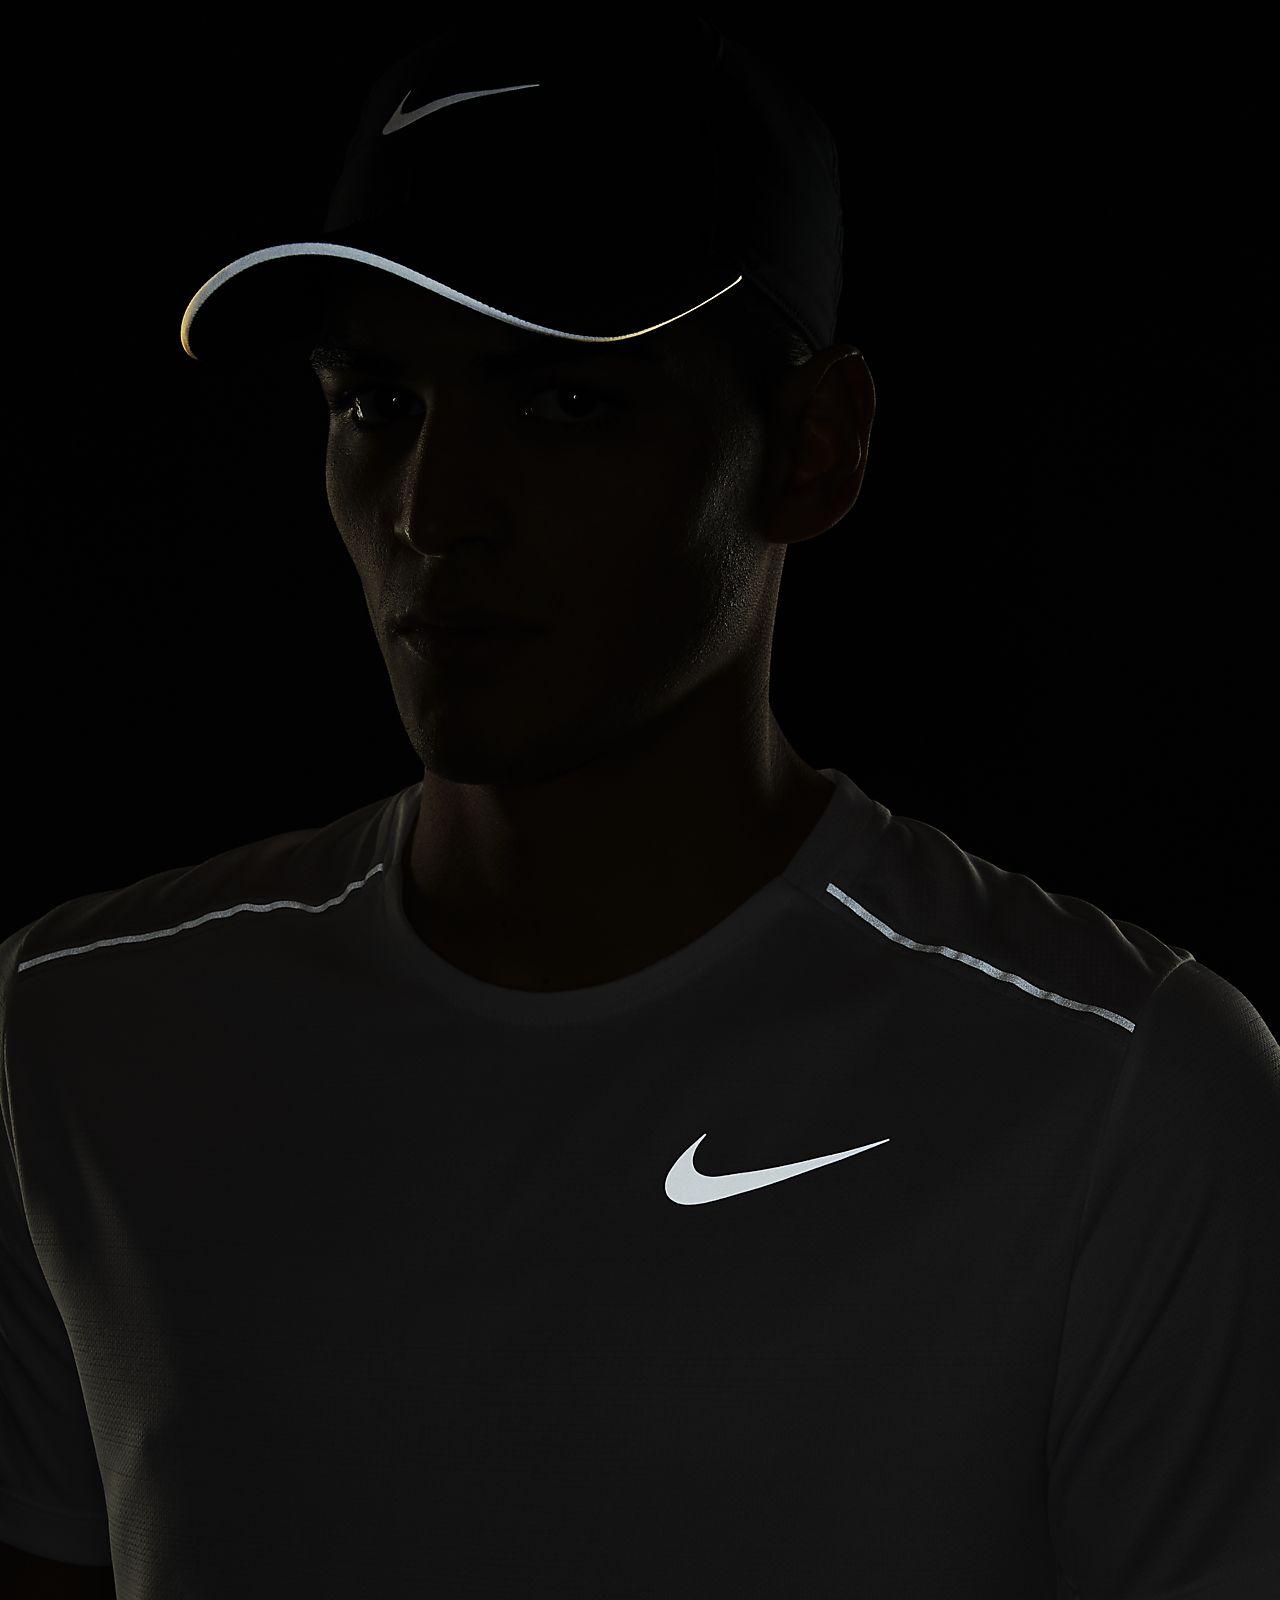 9a65c3c39 Nike Dri-FIT Miler Men's Short-Sleeve Running Top. Nike.com